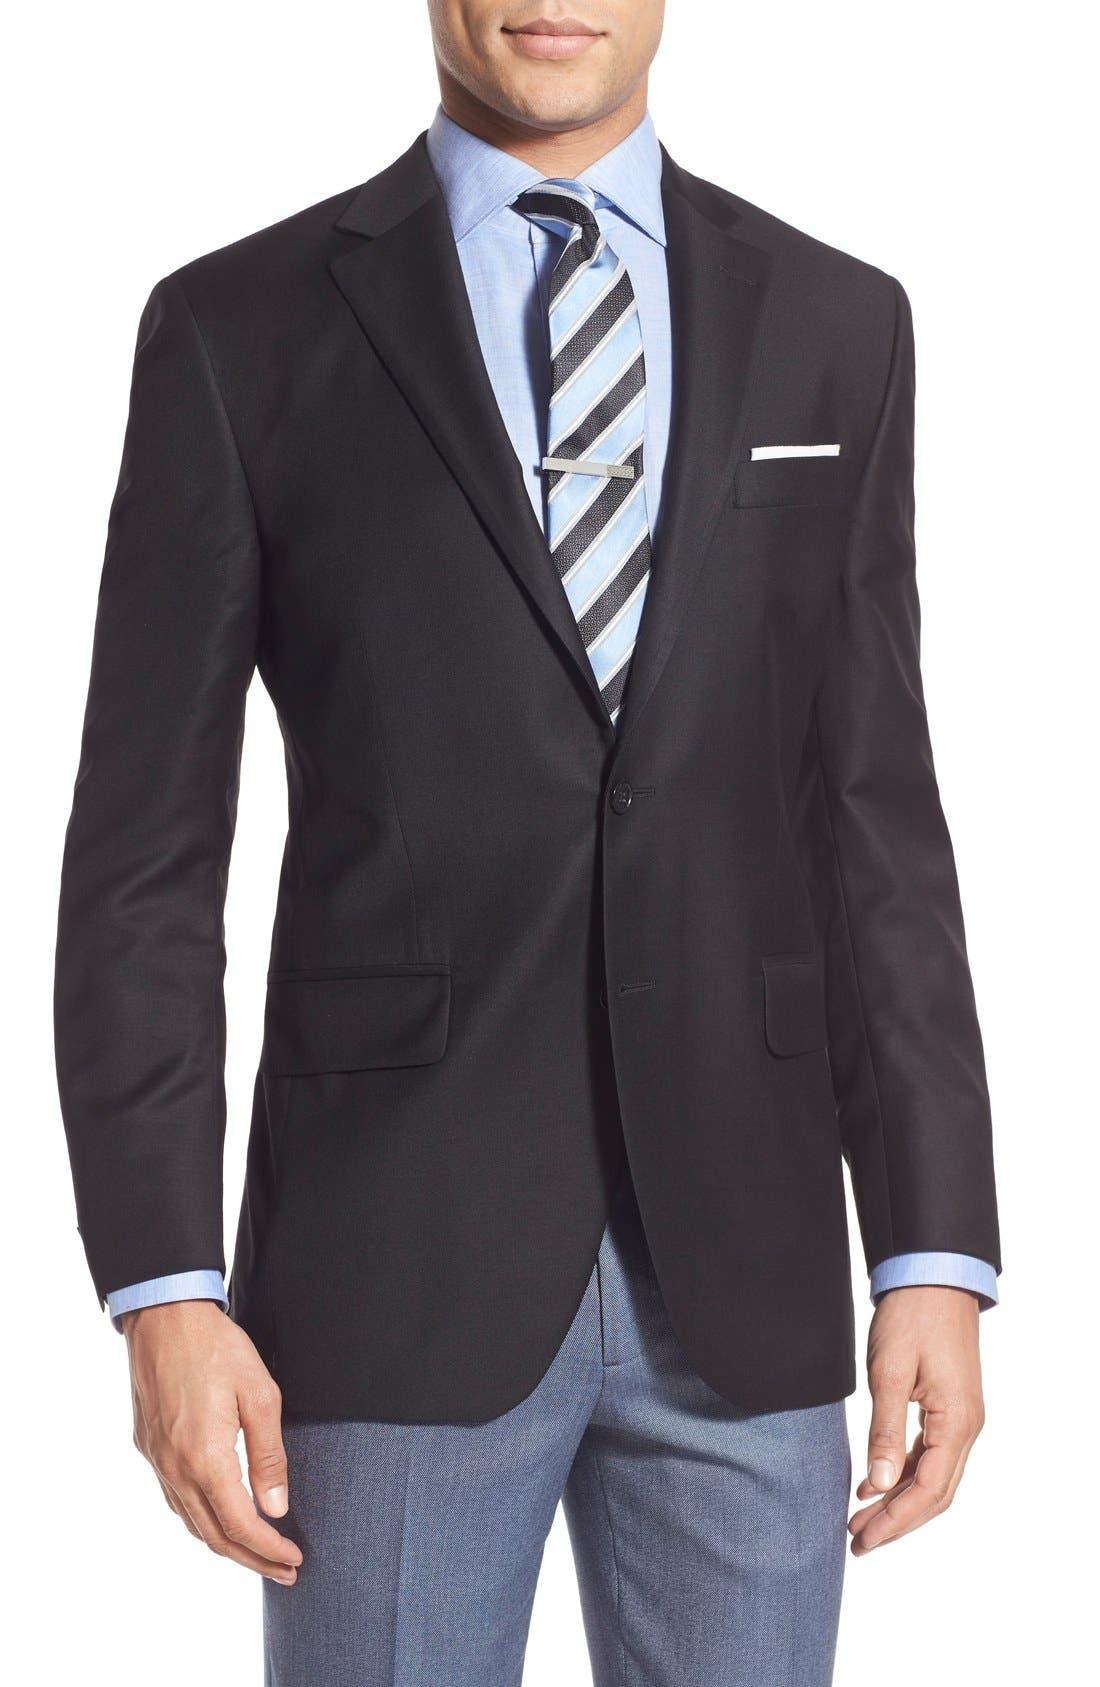 Alternate Image 1 Selected - Peter Millar 'Flynn' Classic Fit Wool Blazer